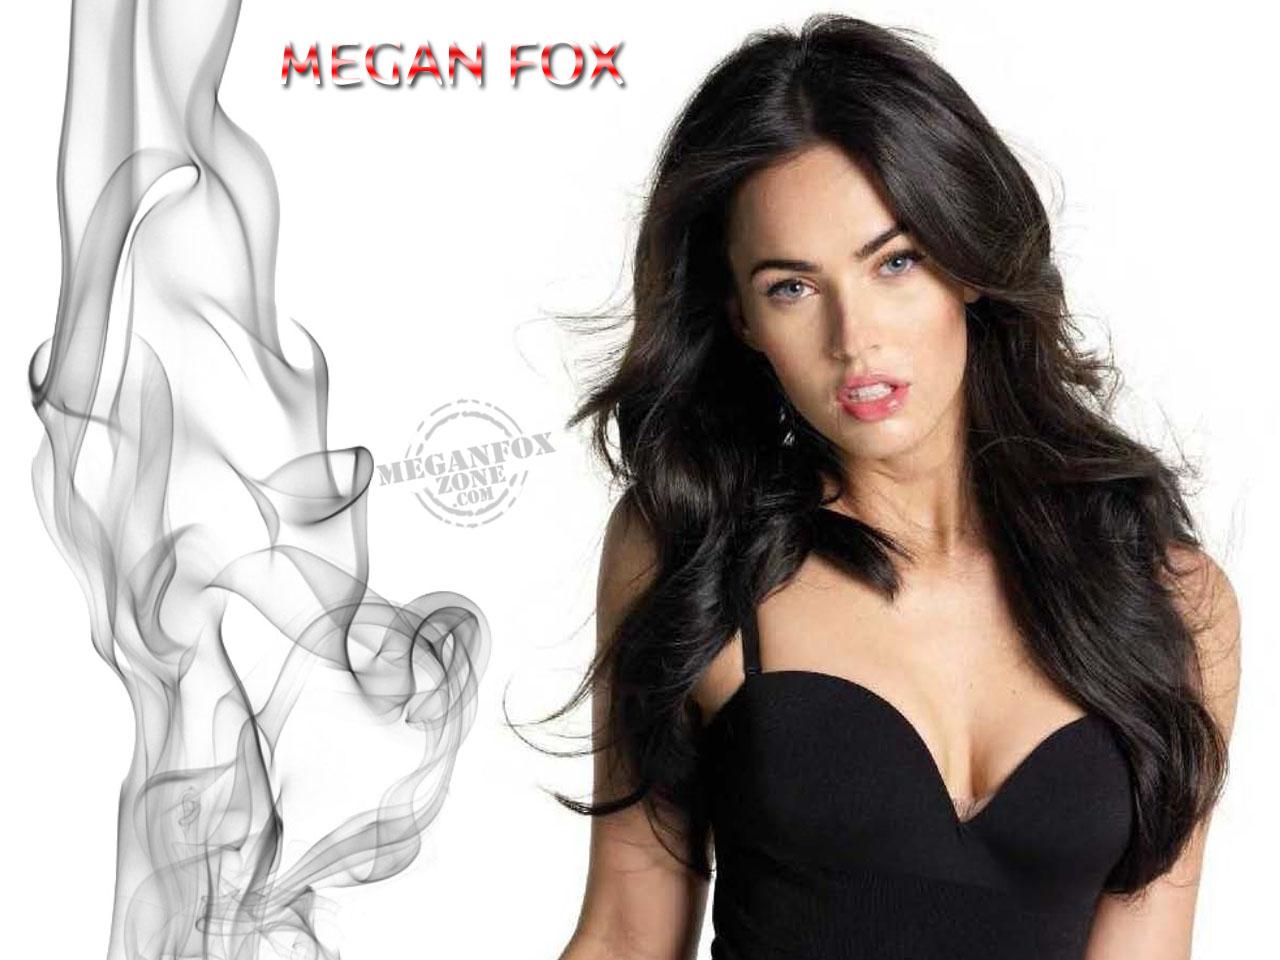 http://4.bp.blogspot.com/-kQ2V_69gn1M/UTueayFORiI/AAAAAAAAITc/Bo-pJc4Me3g/s1600/Megan+Fox+0.jpg